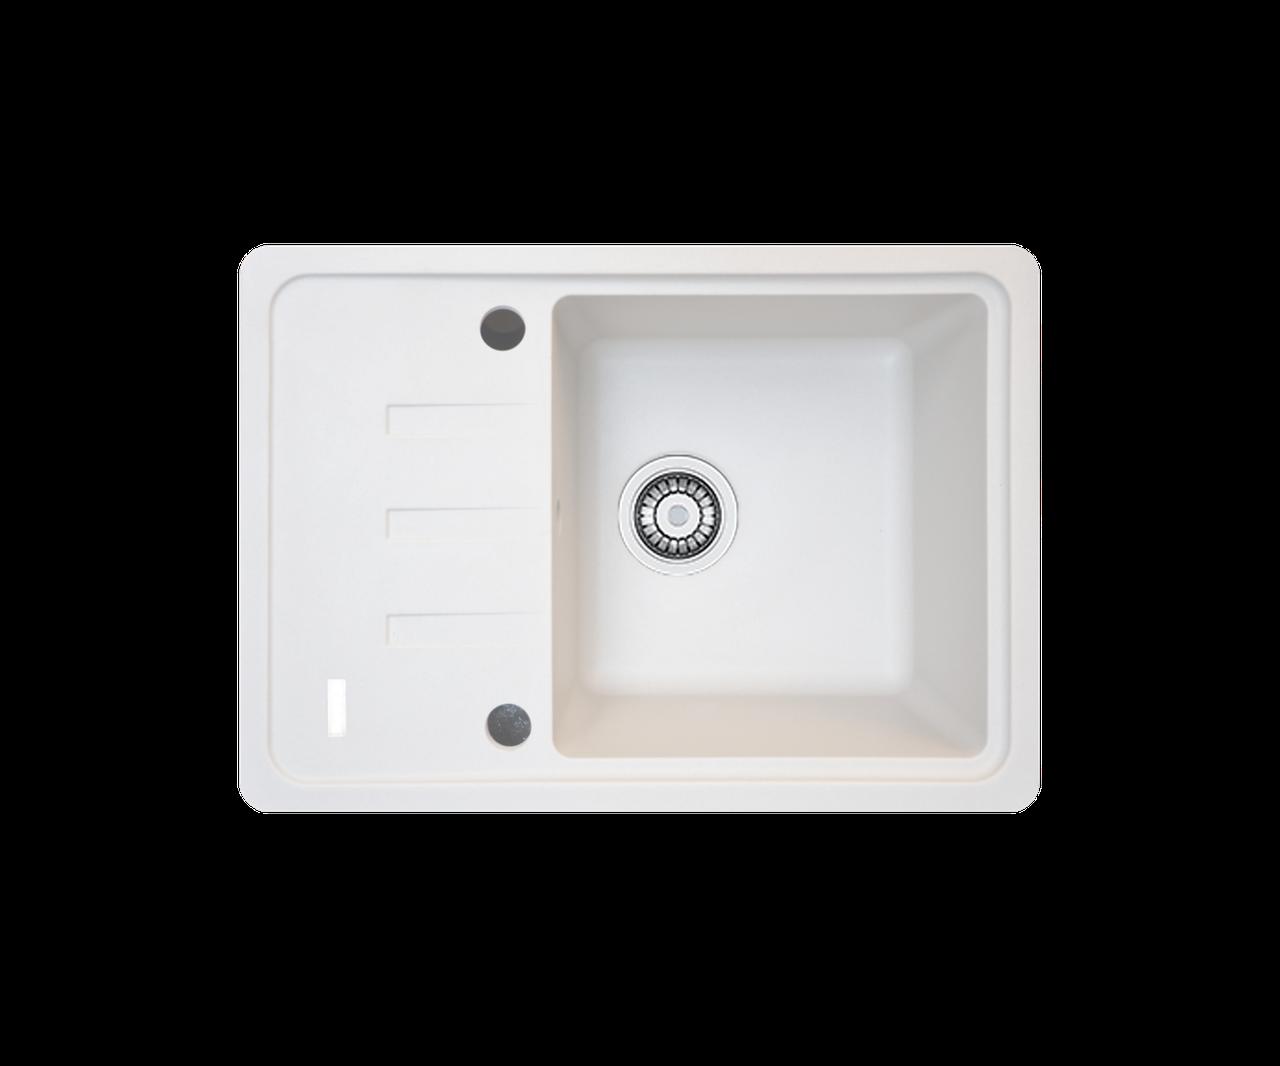 Кухонна мийка гранітна Borgio PRC-620х435  перлистий